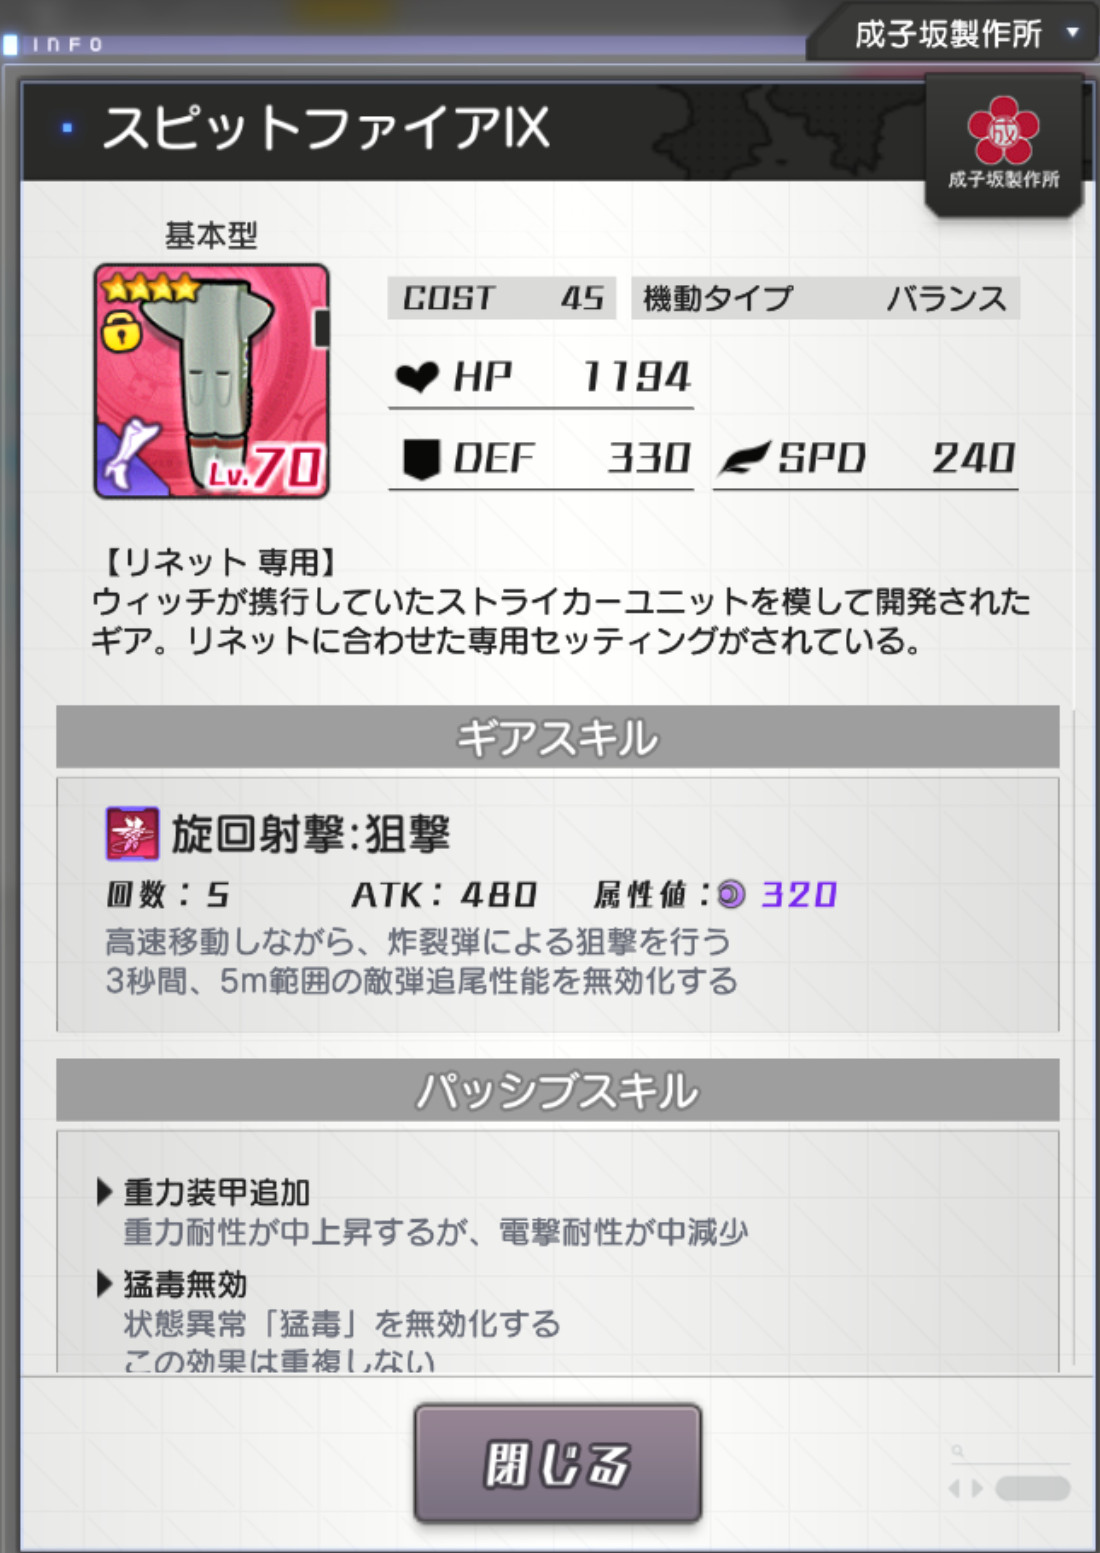 RNb_70.jpg